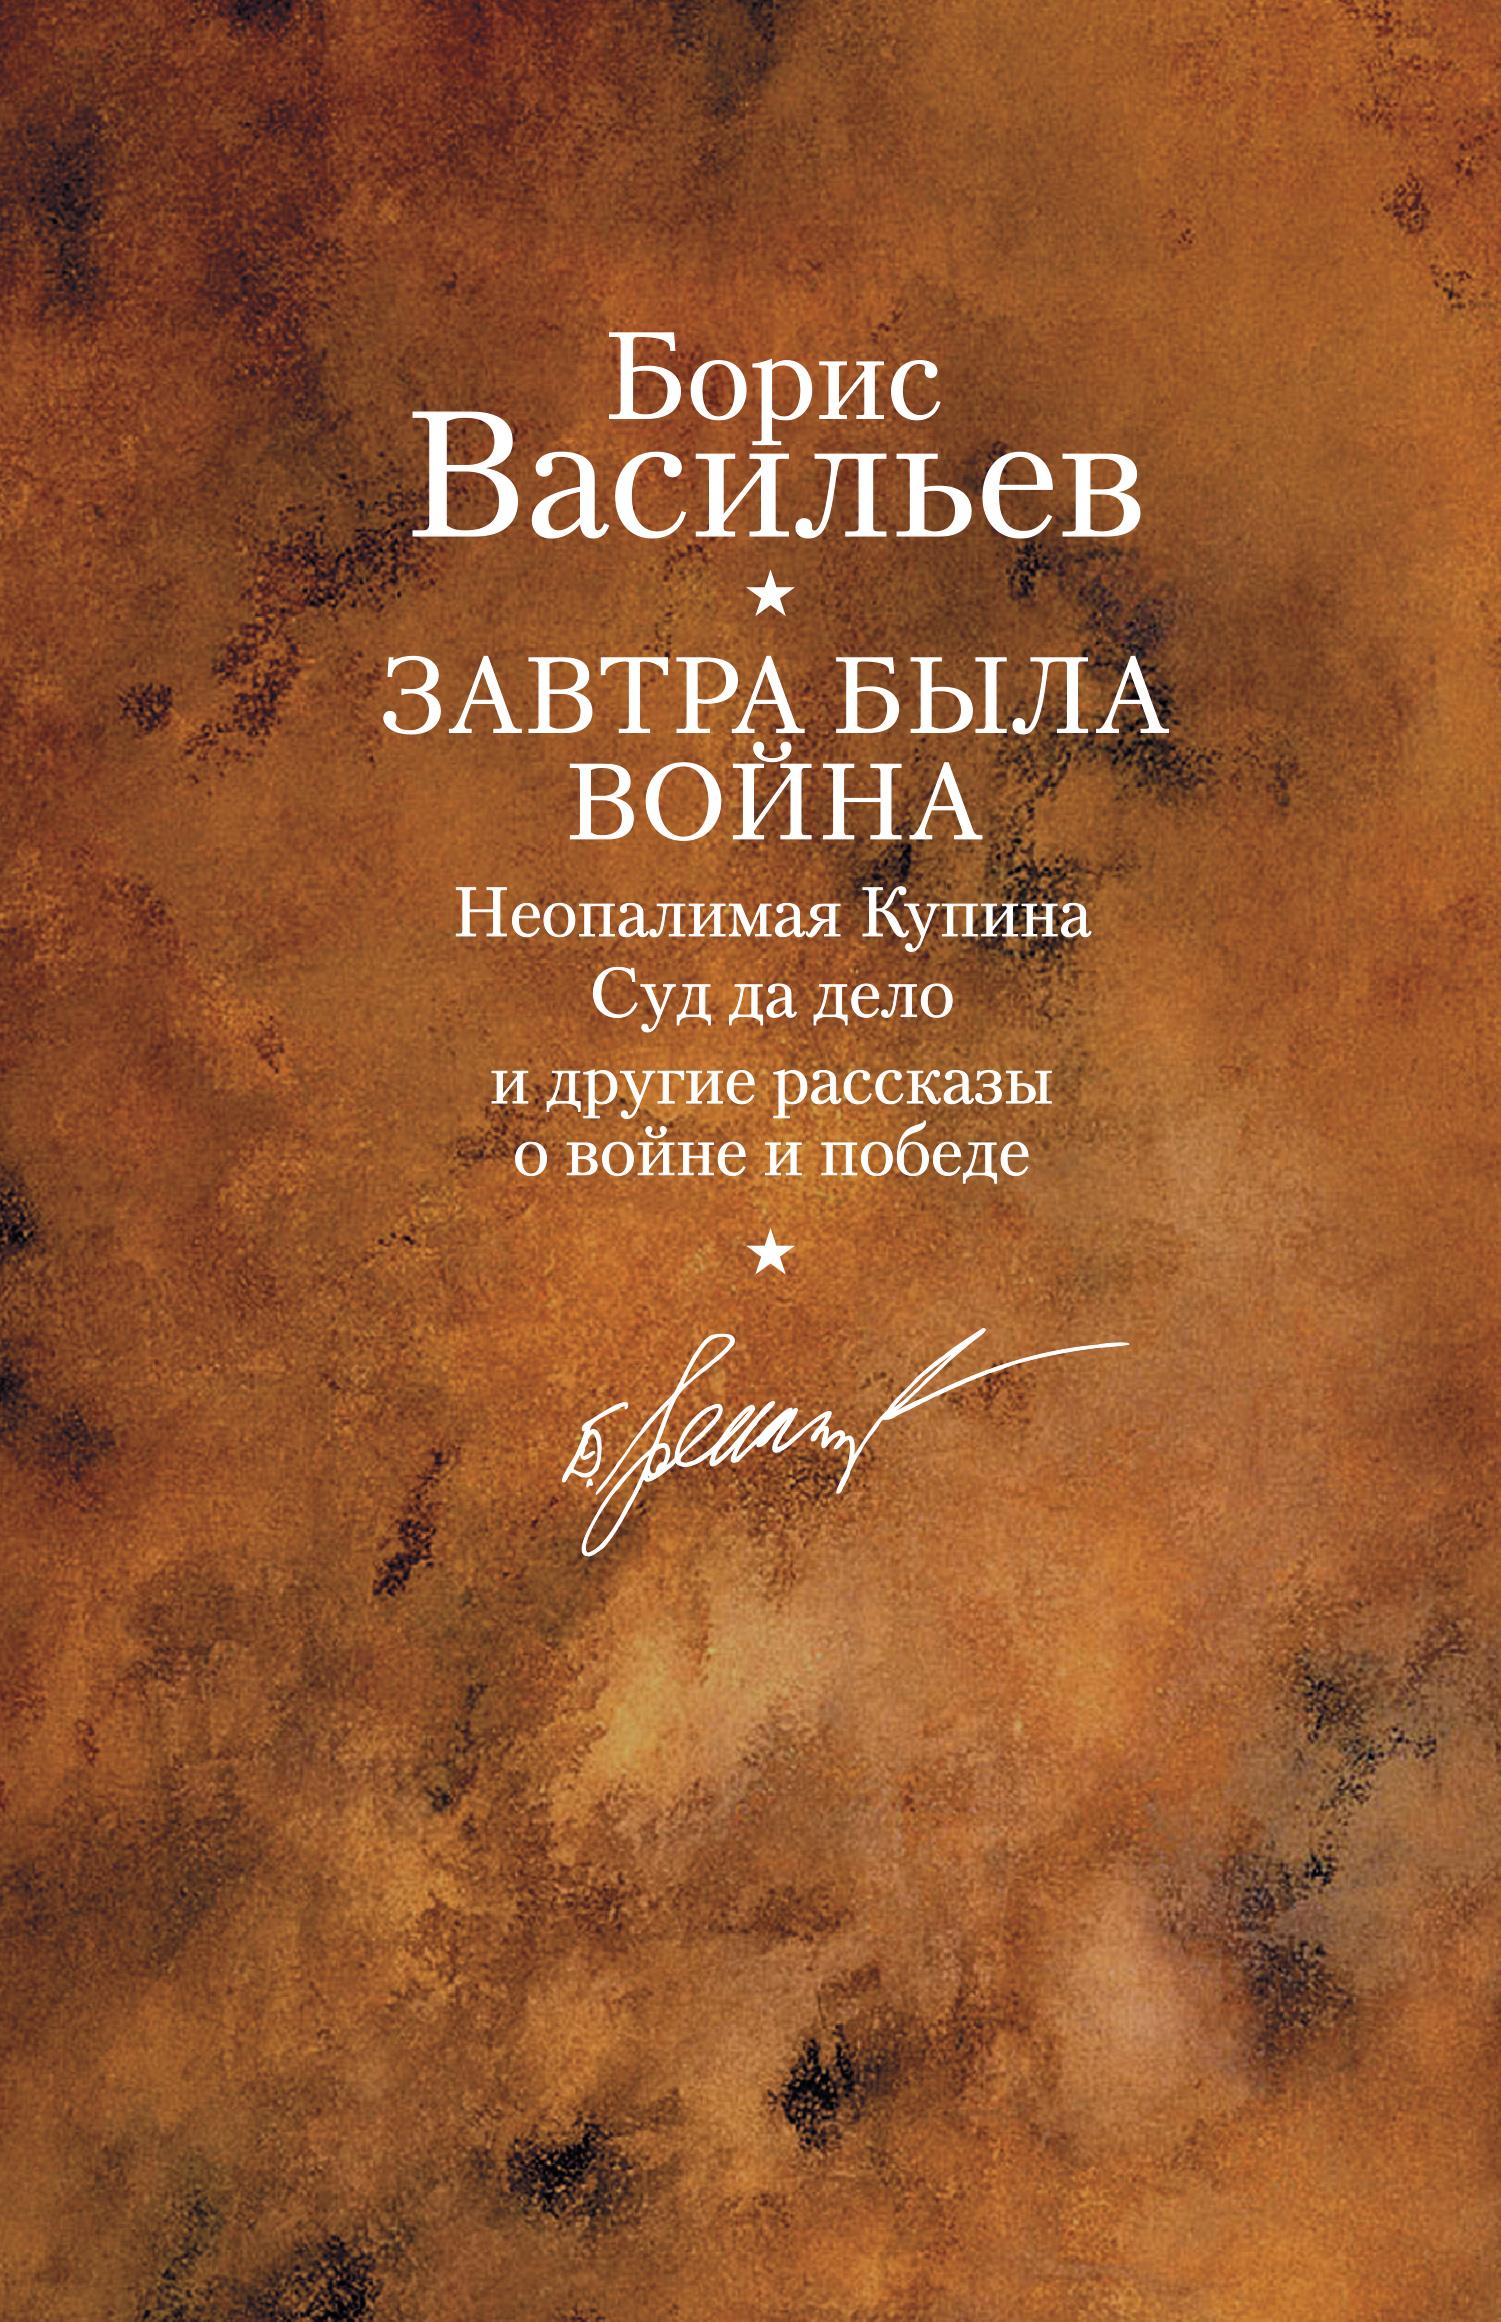 Борис Васильев Неопалимая купина пресвятая богородица неопалимая купина